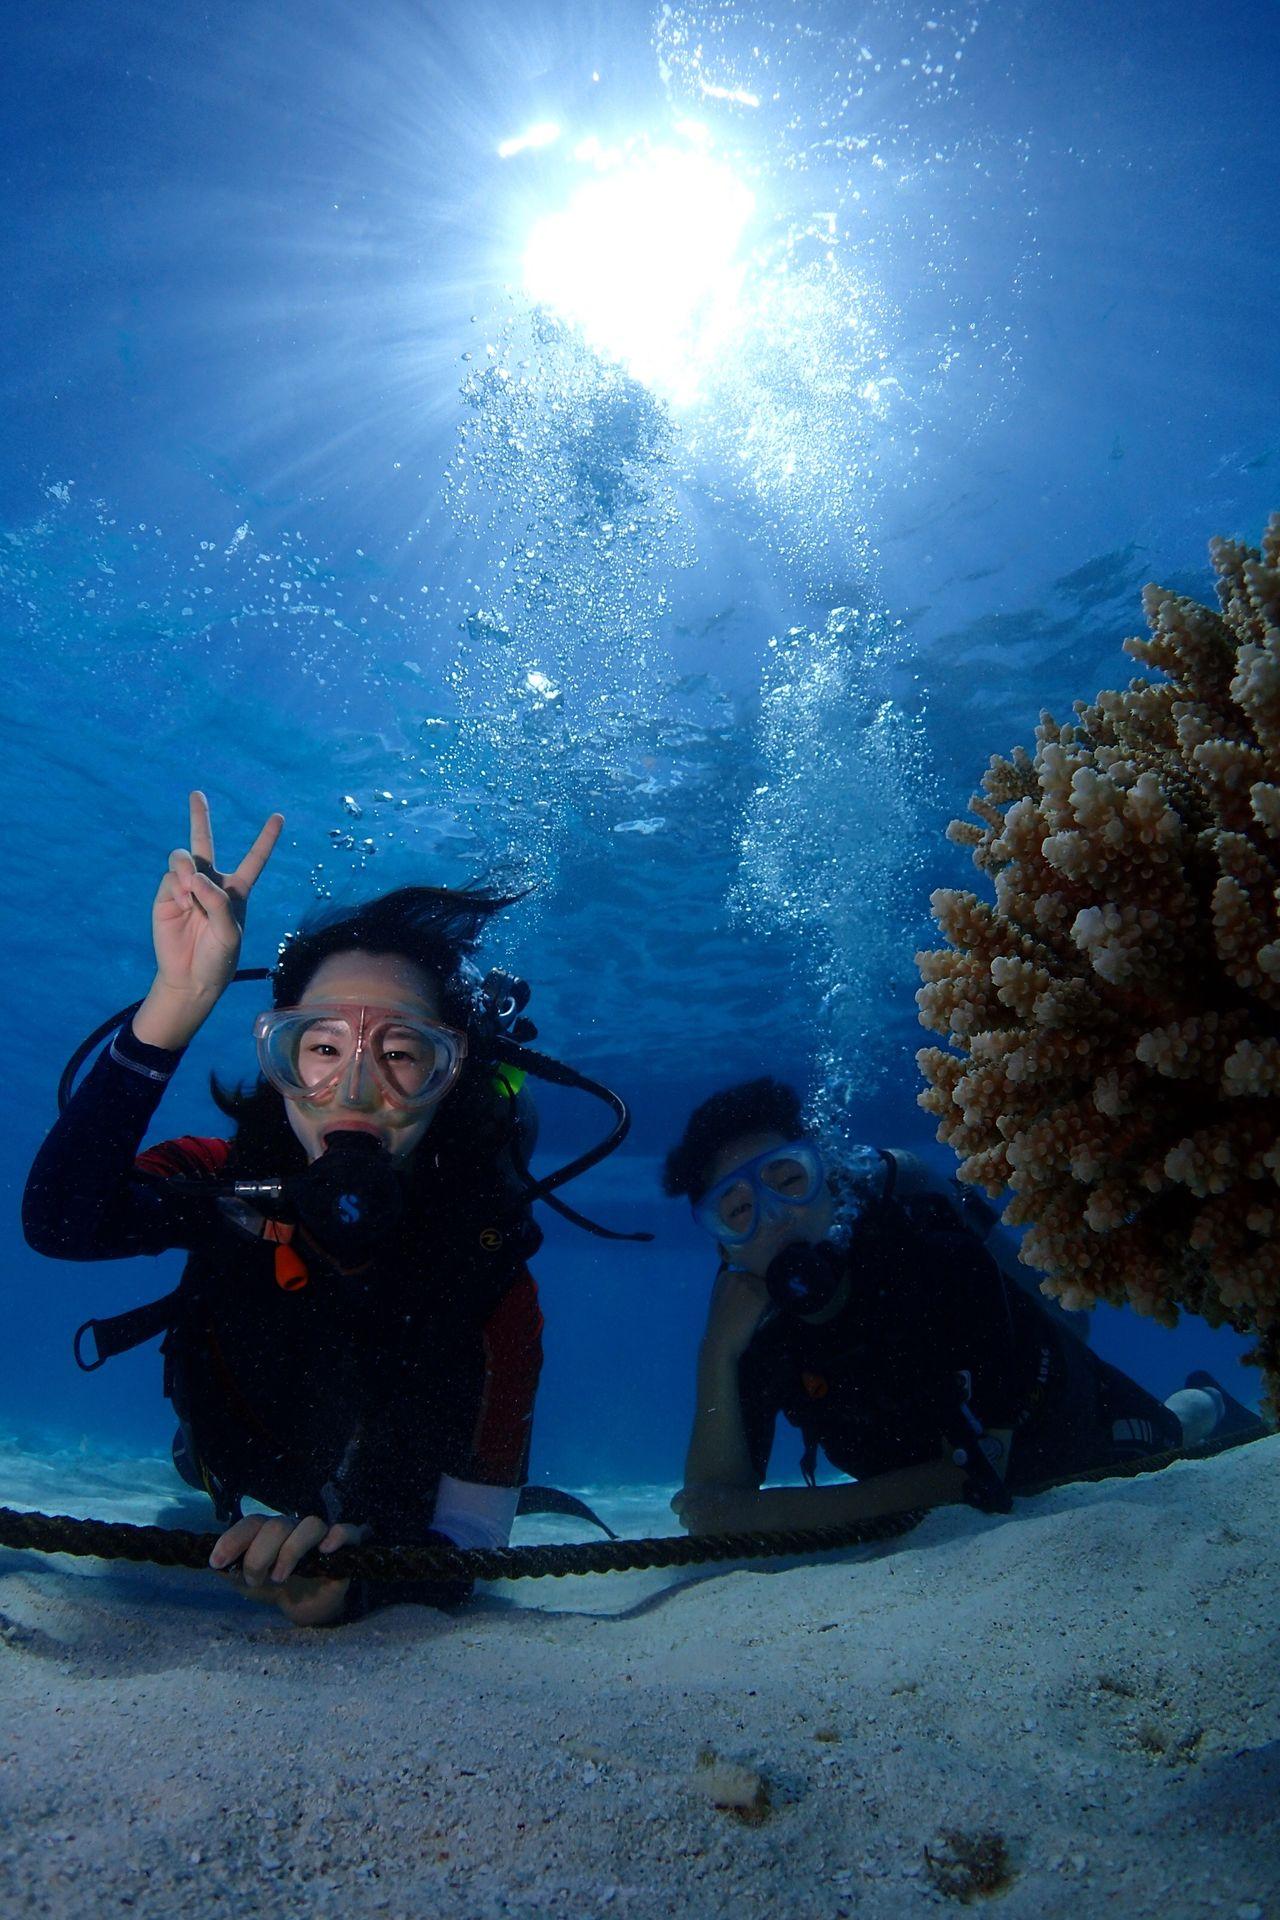 Introdiving Scubadiving Saipan Divey2k 체험다이빙 사이판